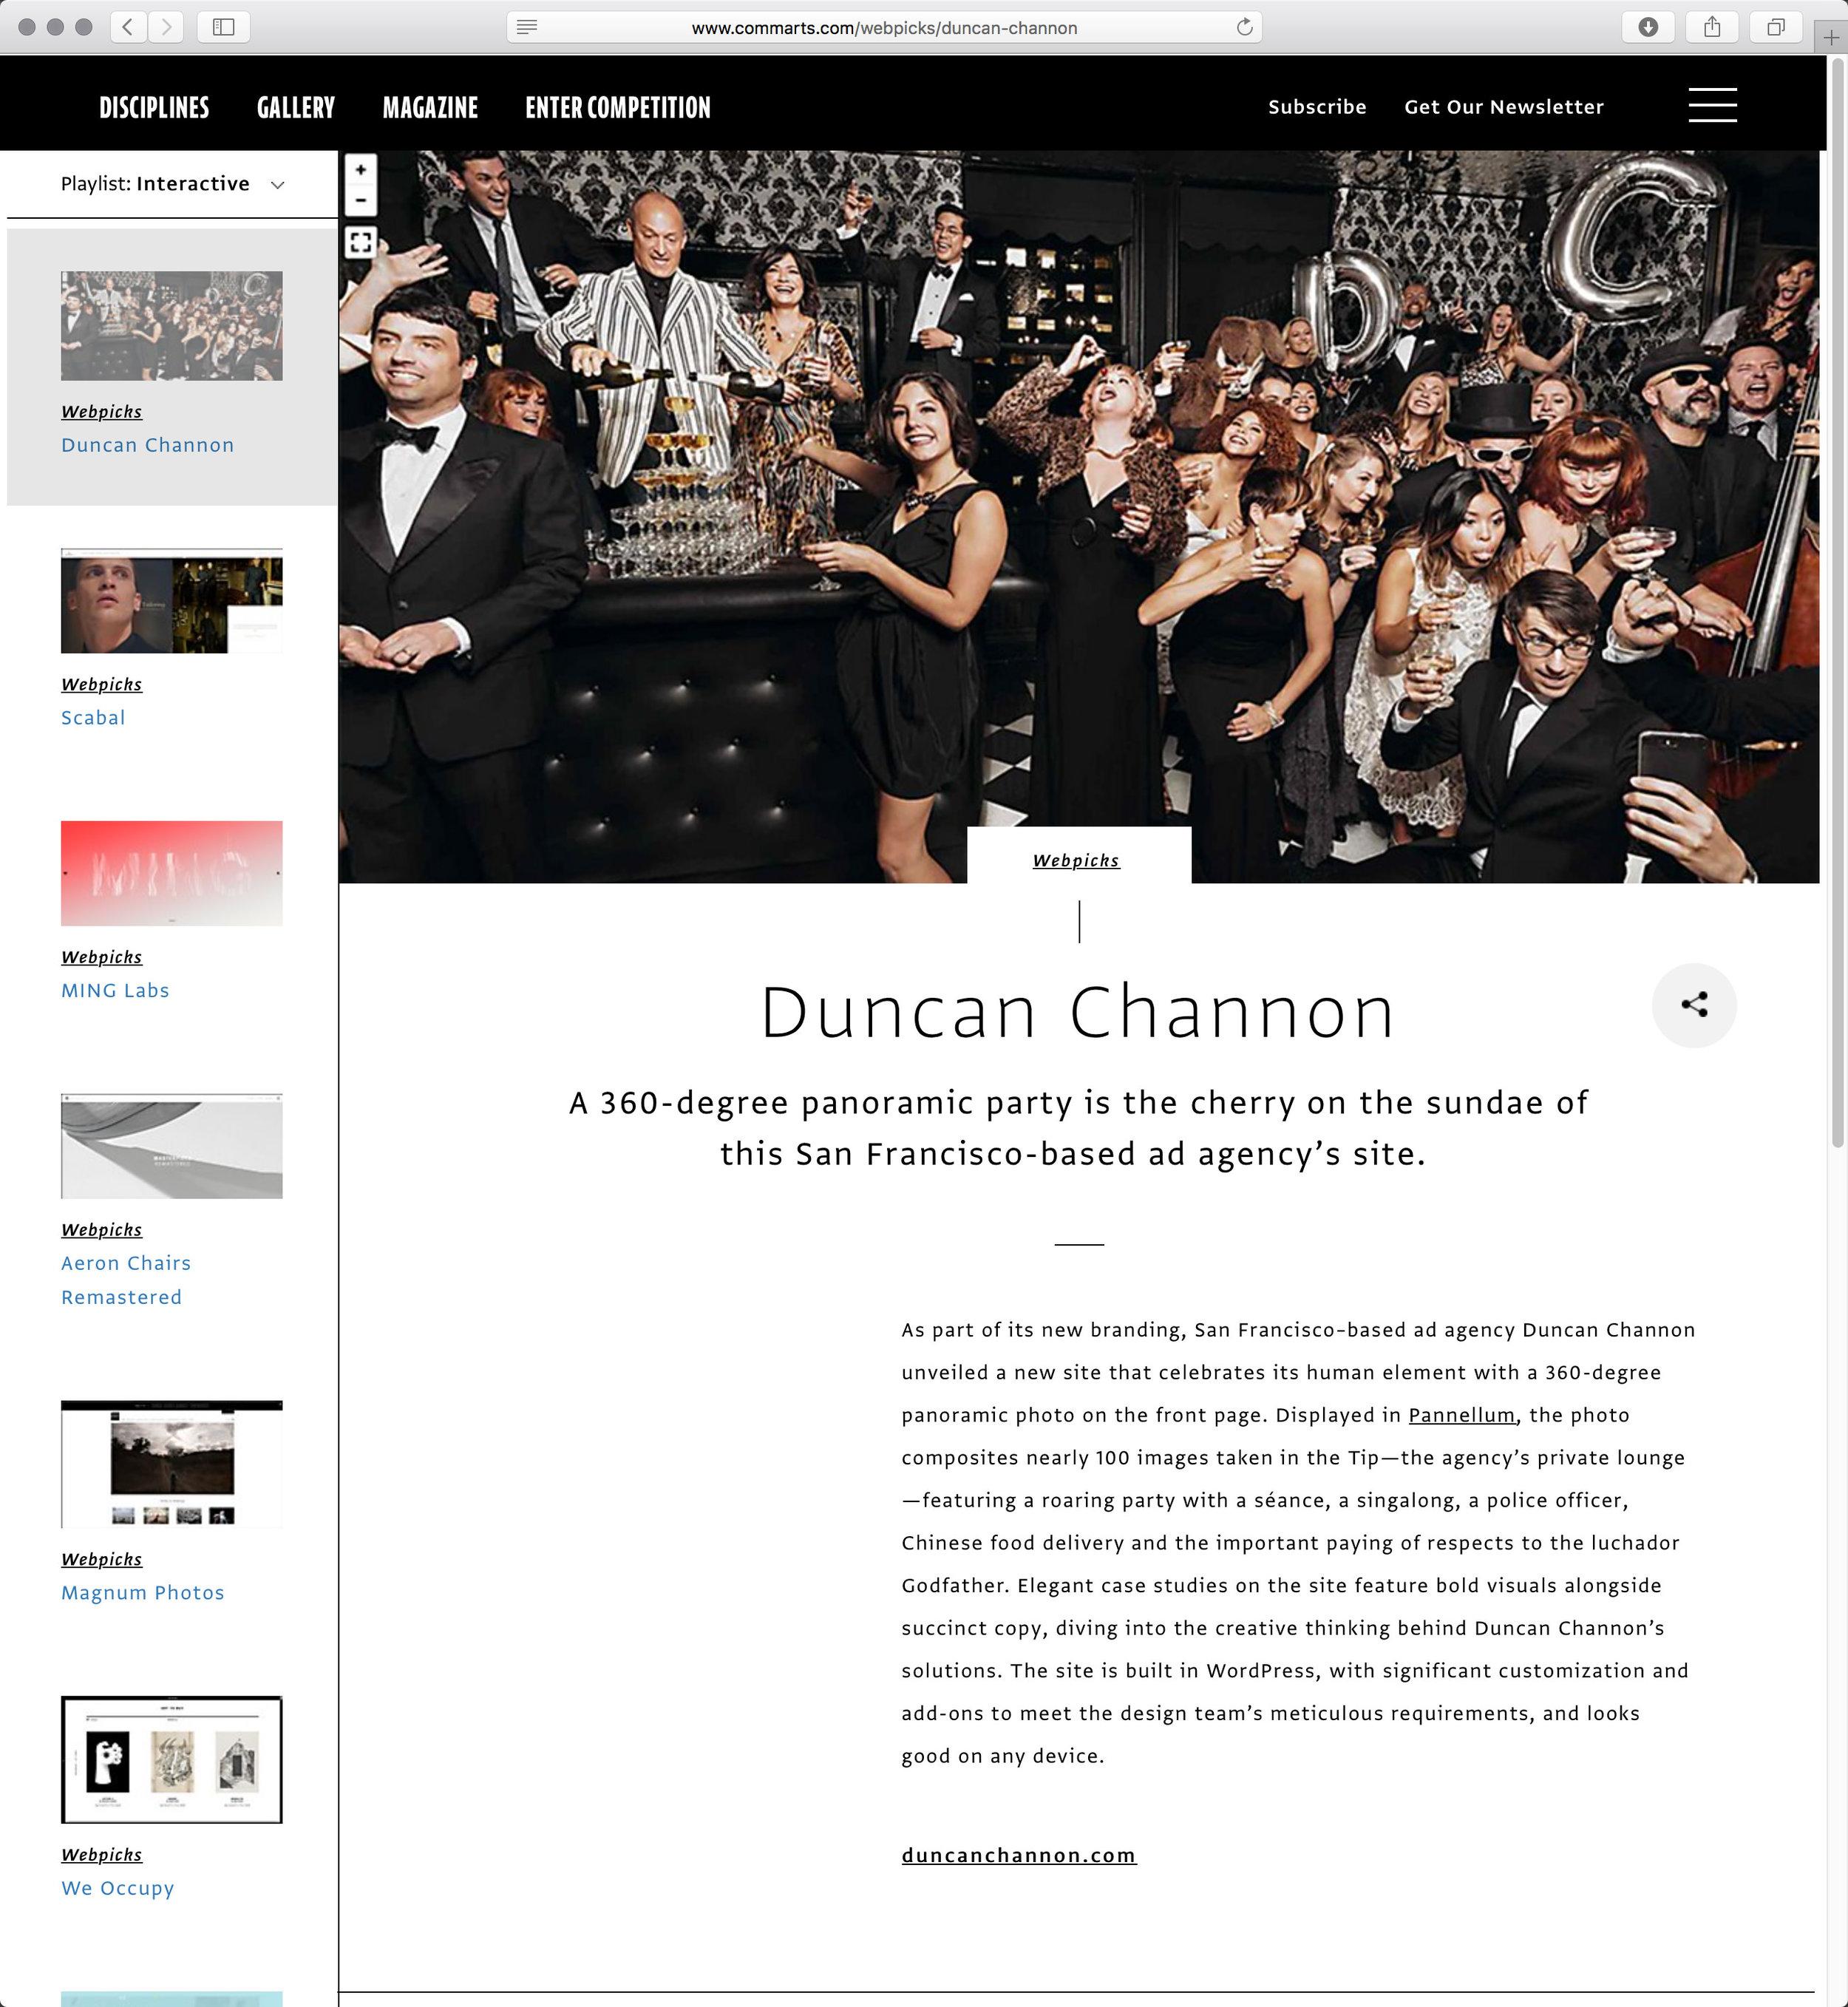 Communication Arts Webpicks   Duncan Channon 360 Panorama, Nov 2016